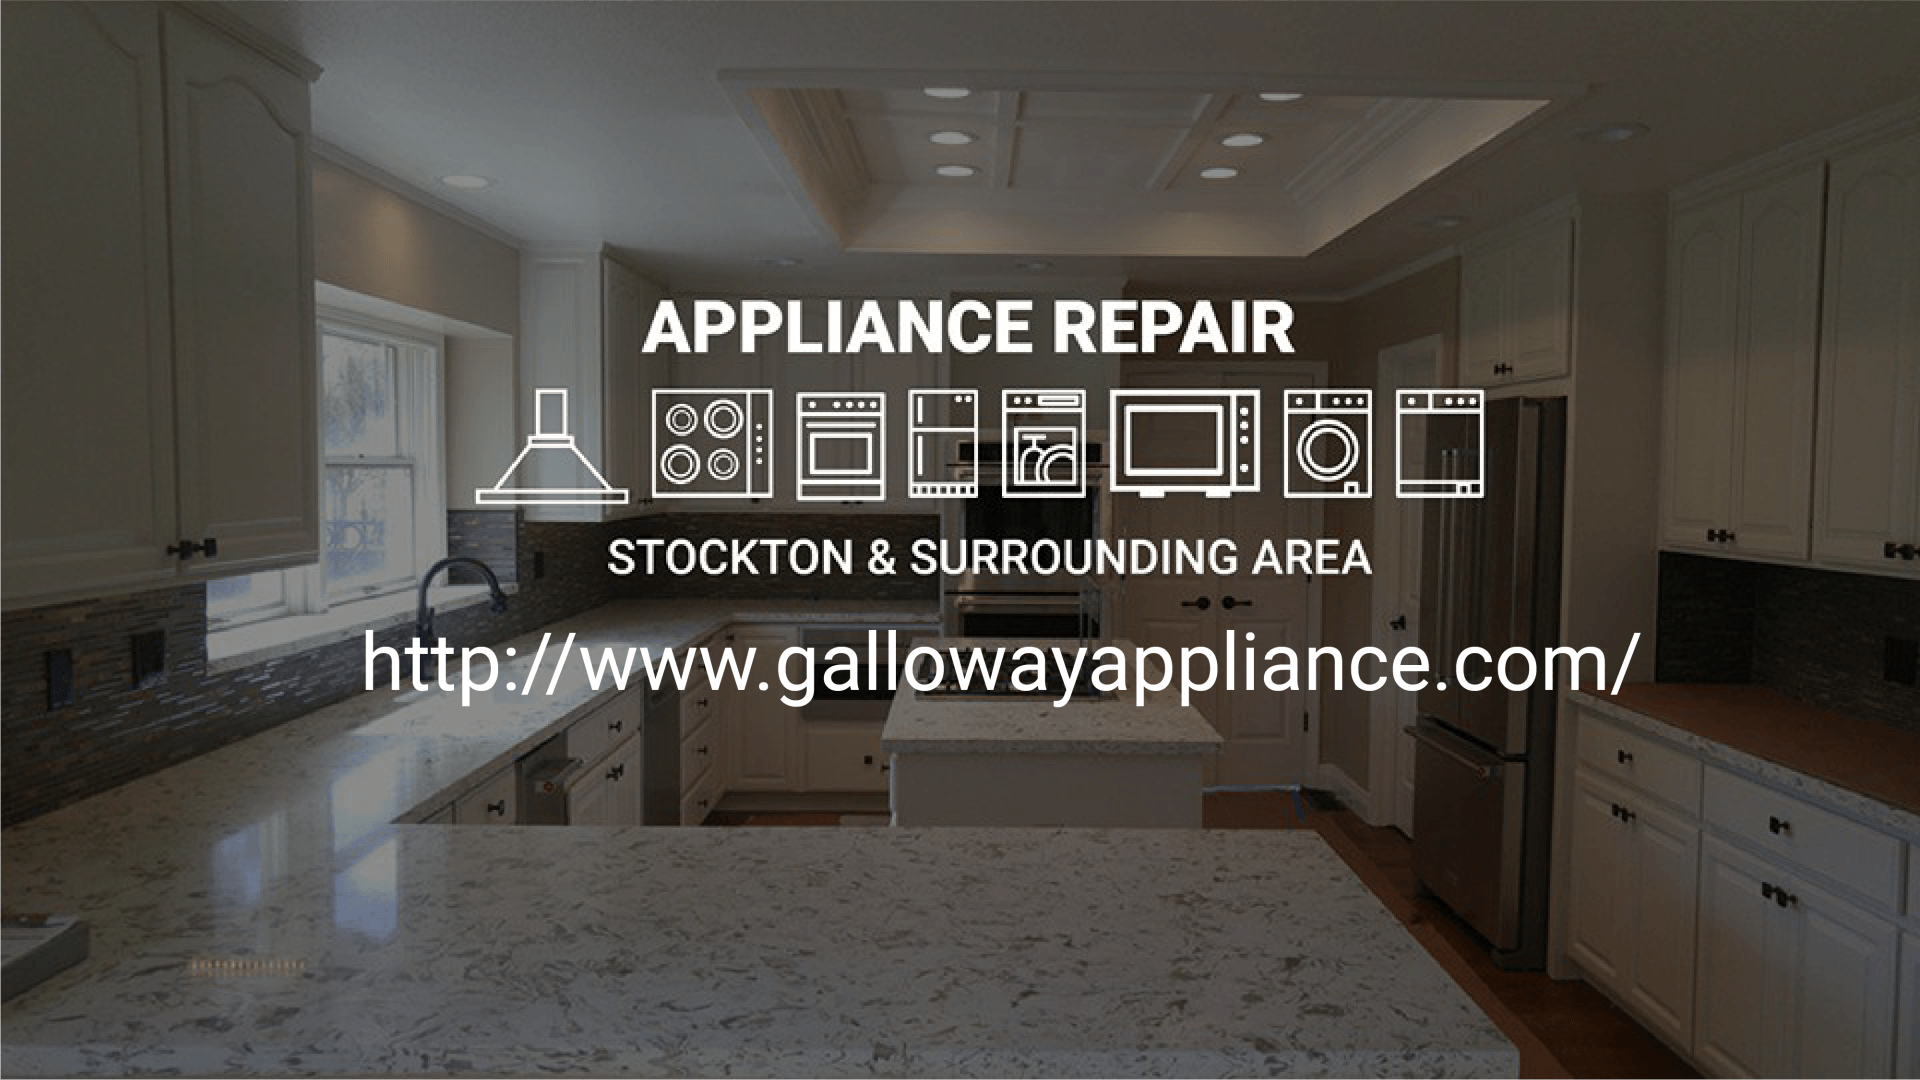 Appliance Repair Stockton Sacramento Appliance Repairs